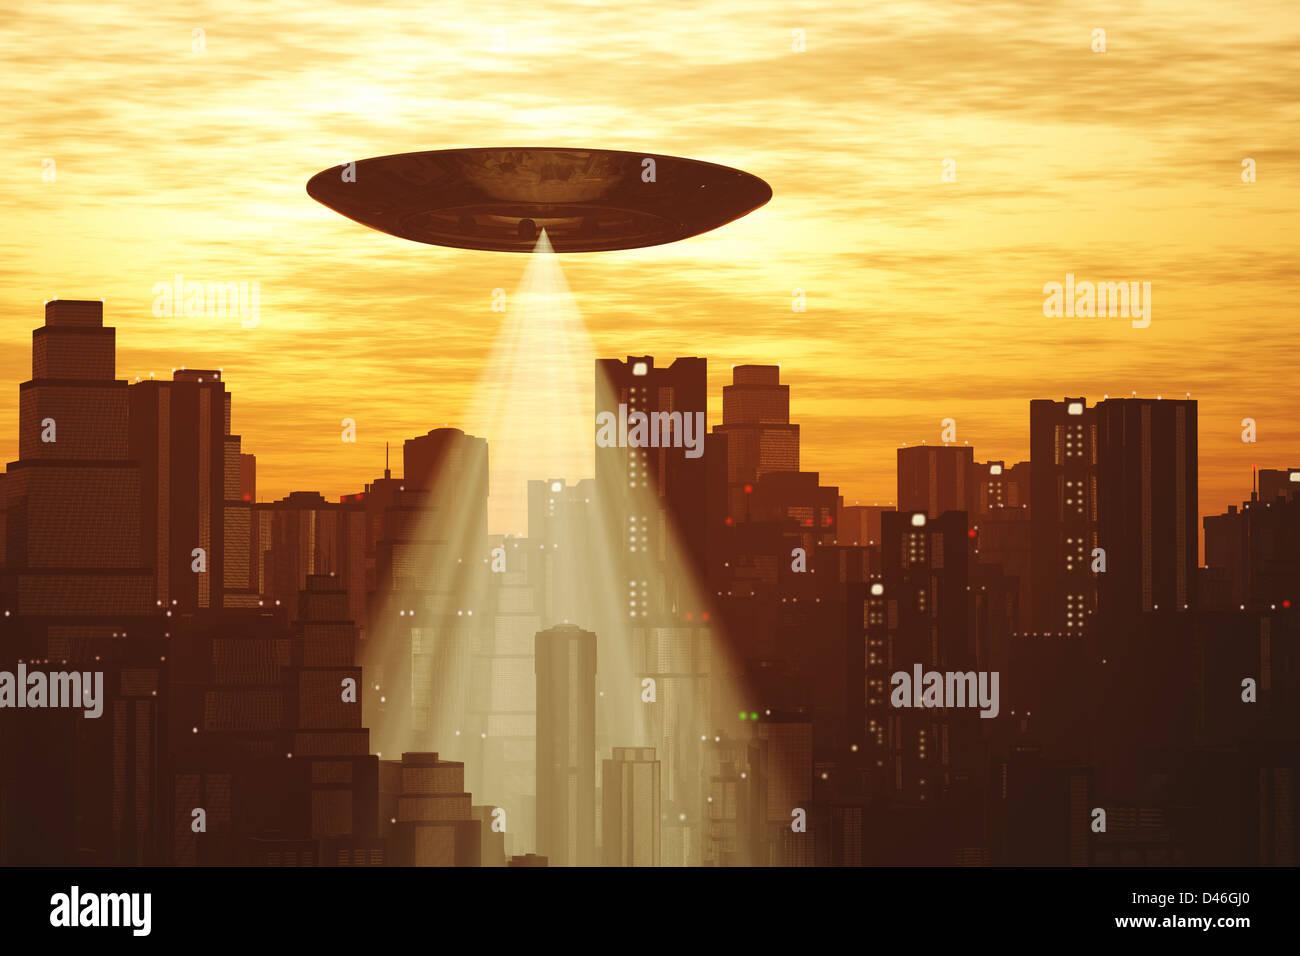 Ufo Invasion over Metropolis - Stock Image